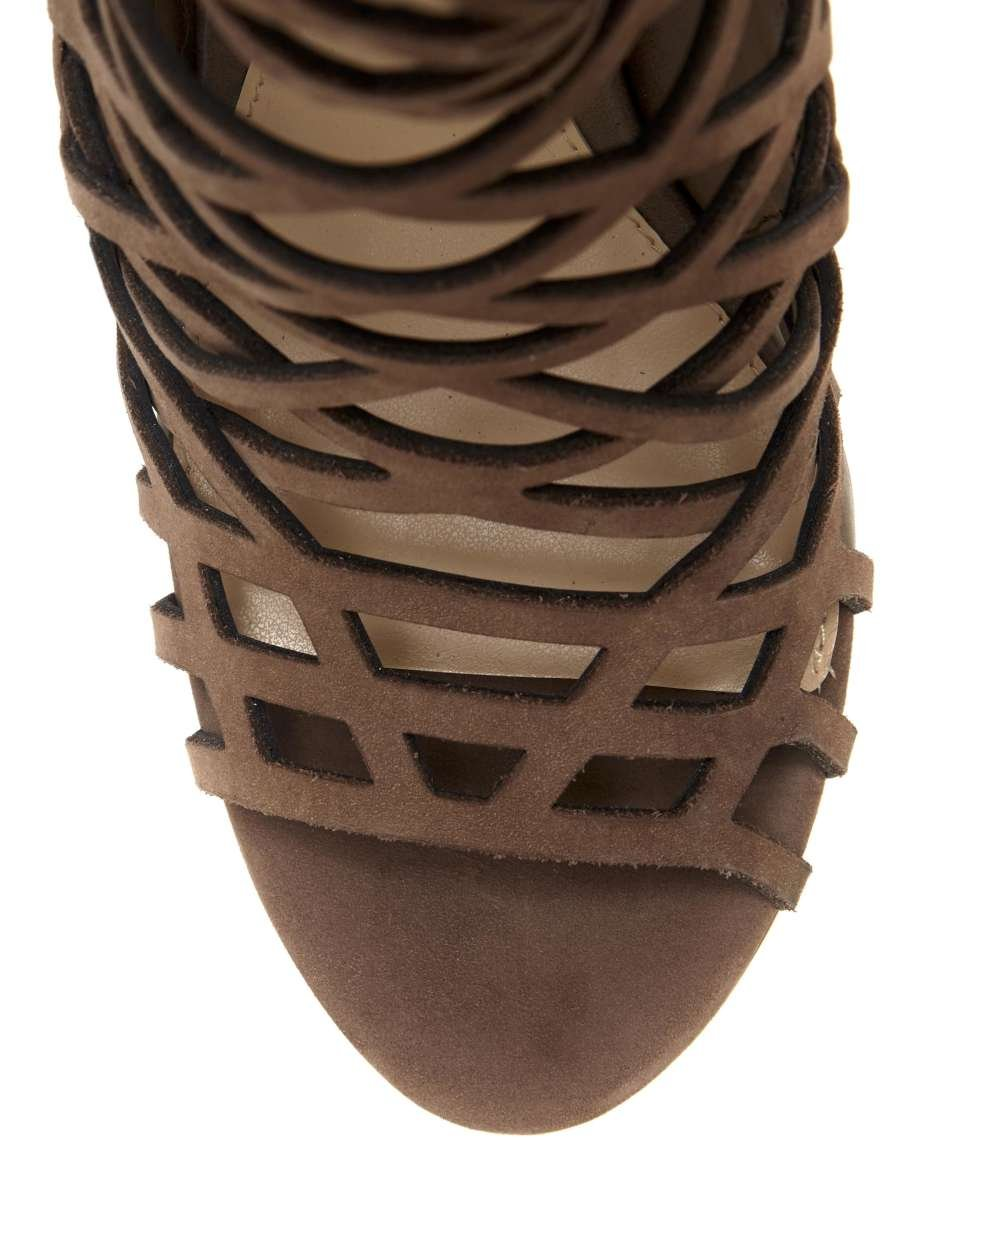 Vince Camuto Women's Keliana Knee High Boot B07D9GFK8M 5 B(M) US|Double Shot Soft Nubuck